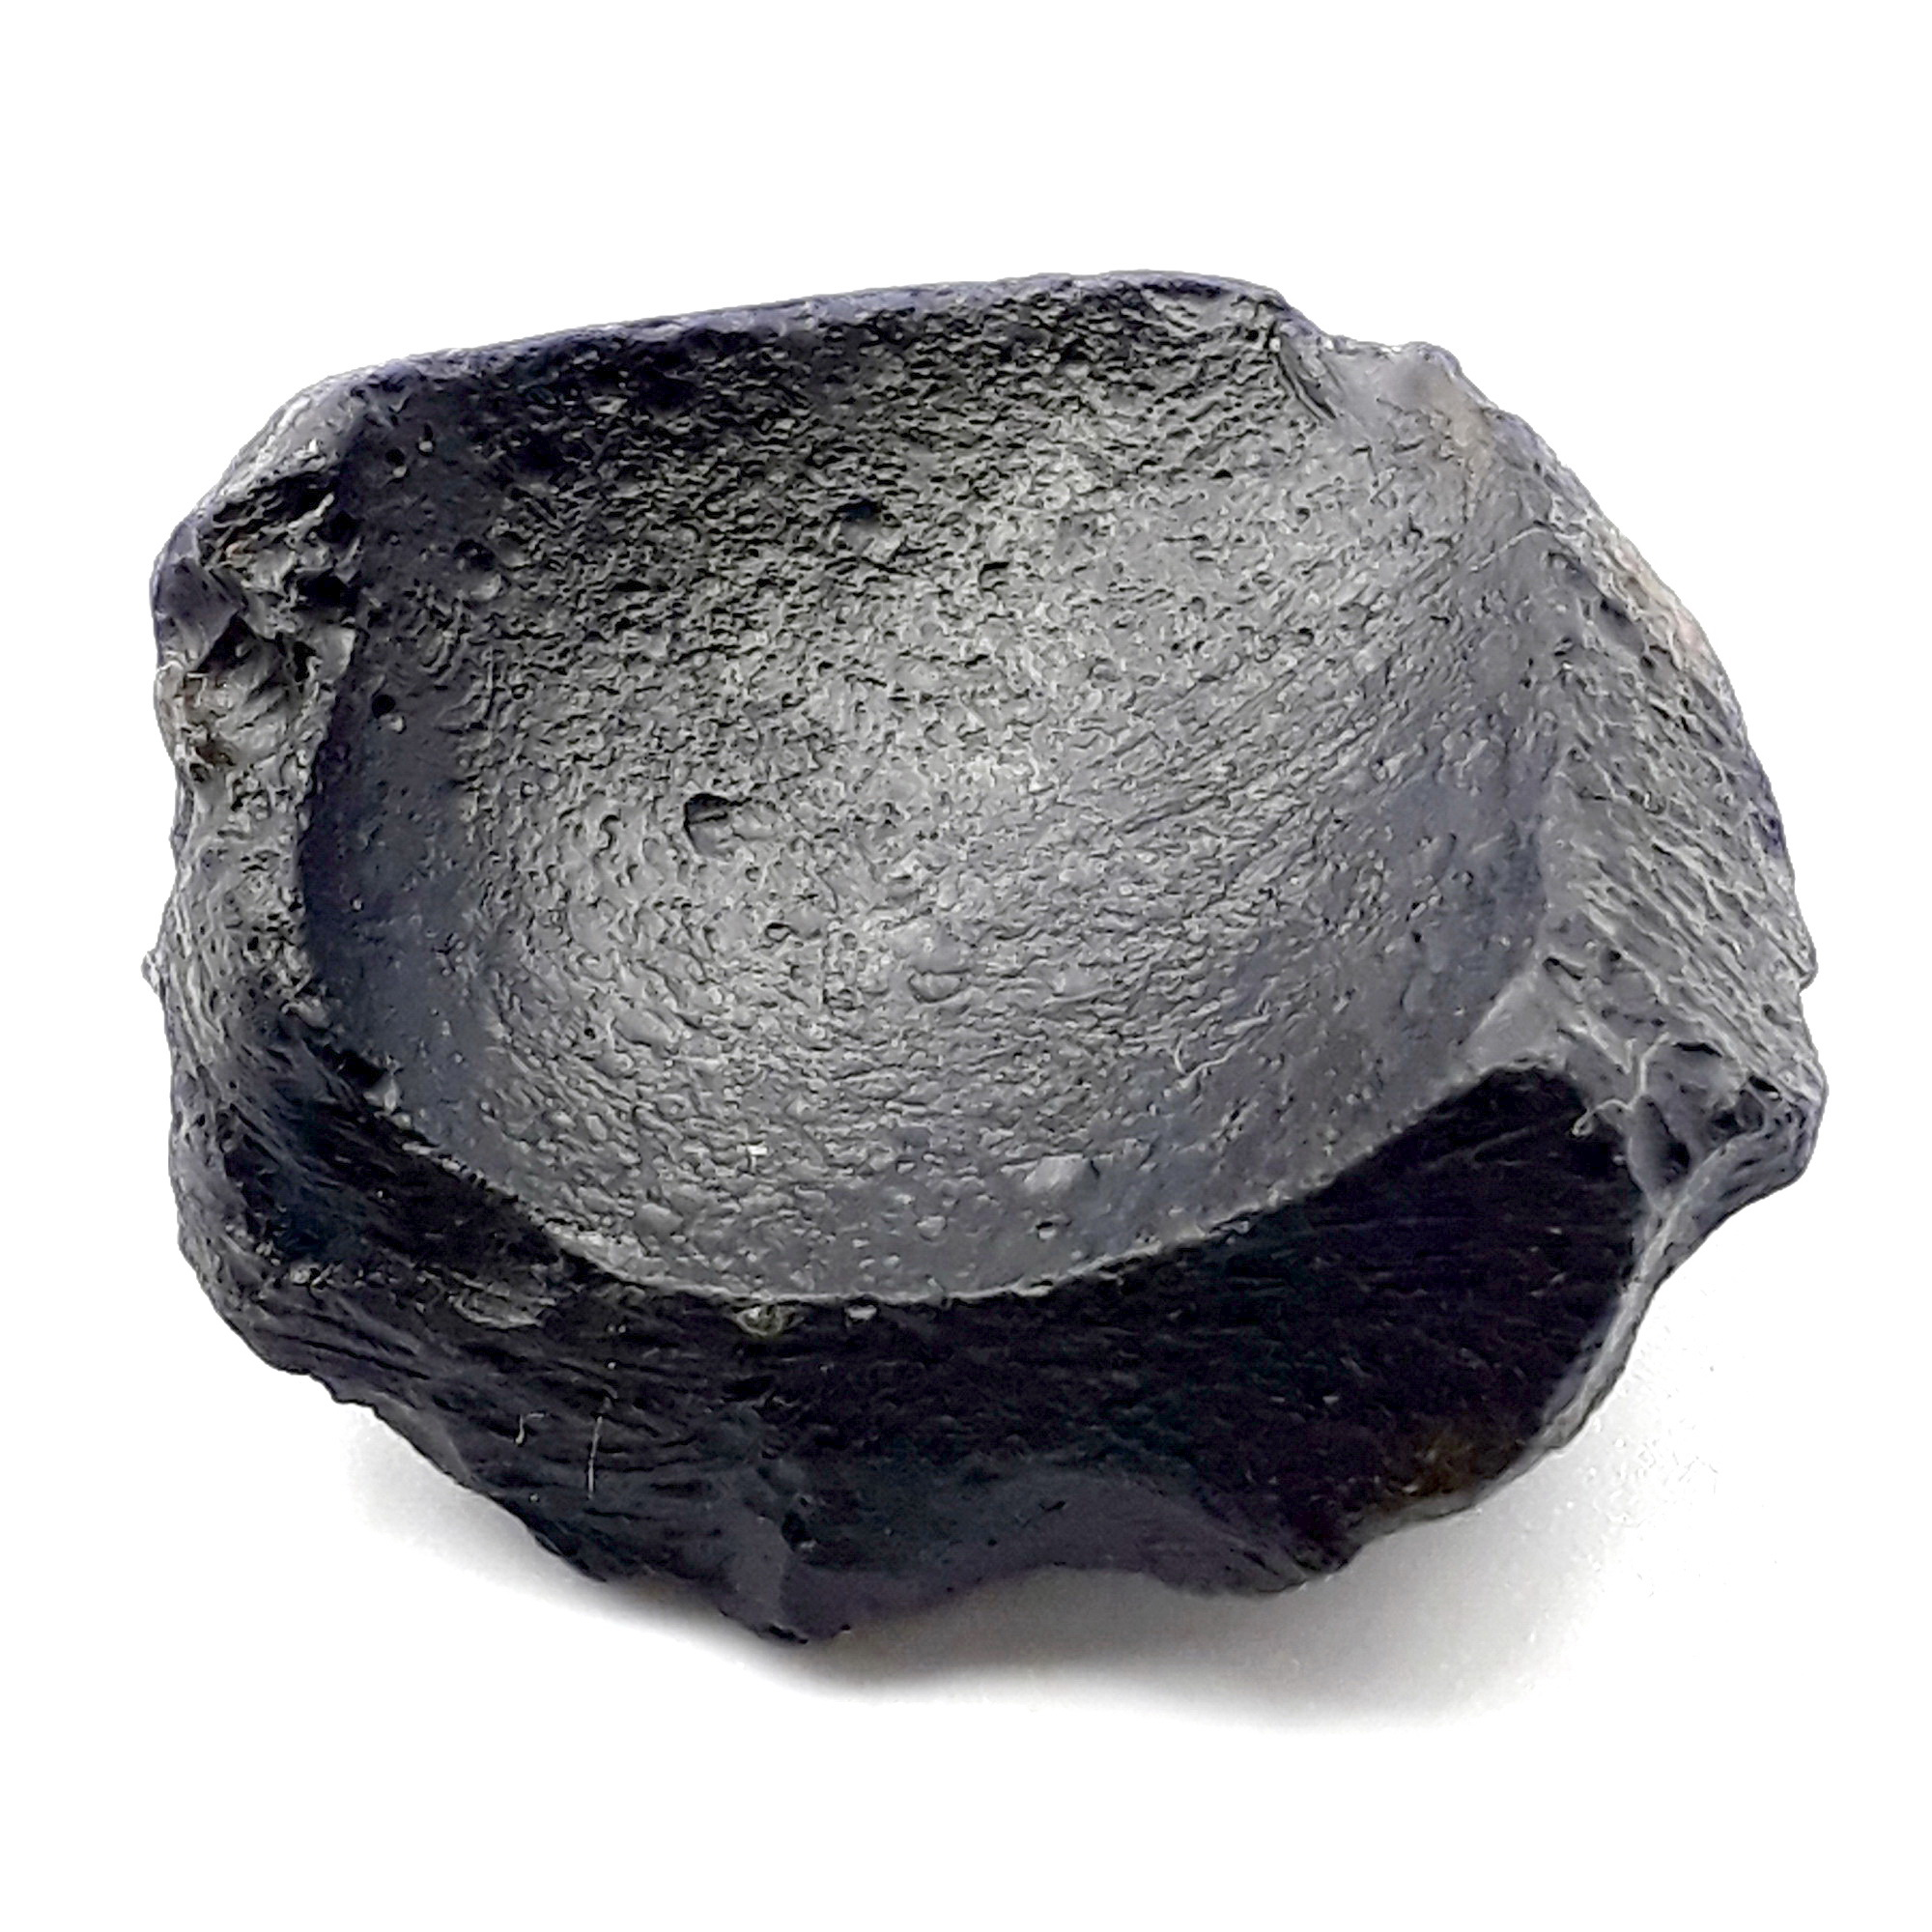 Unique Shape Collectible Collection Indochinite Tektite Meteorite Space Rock 41-44 mm 3 Pcs